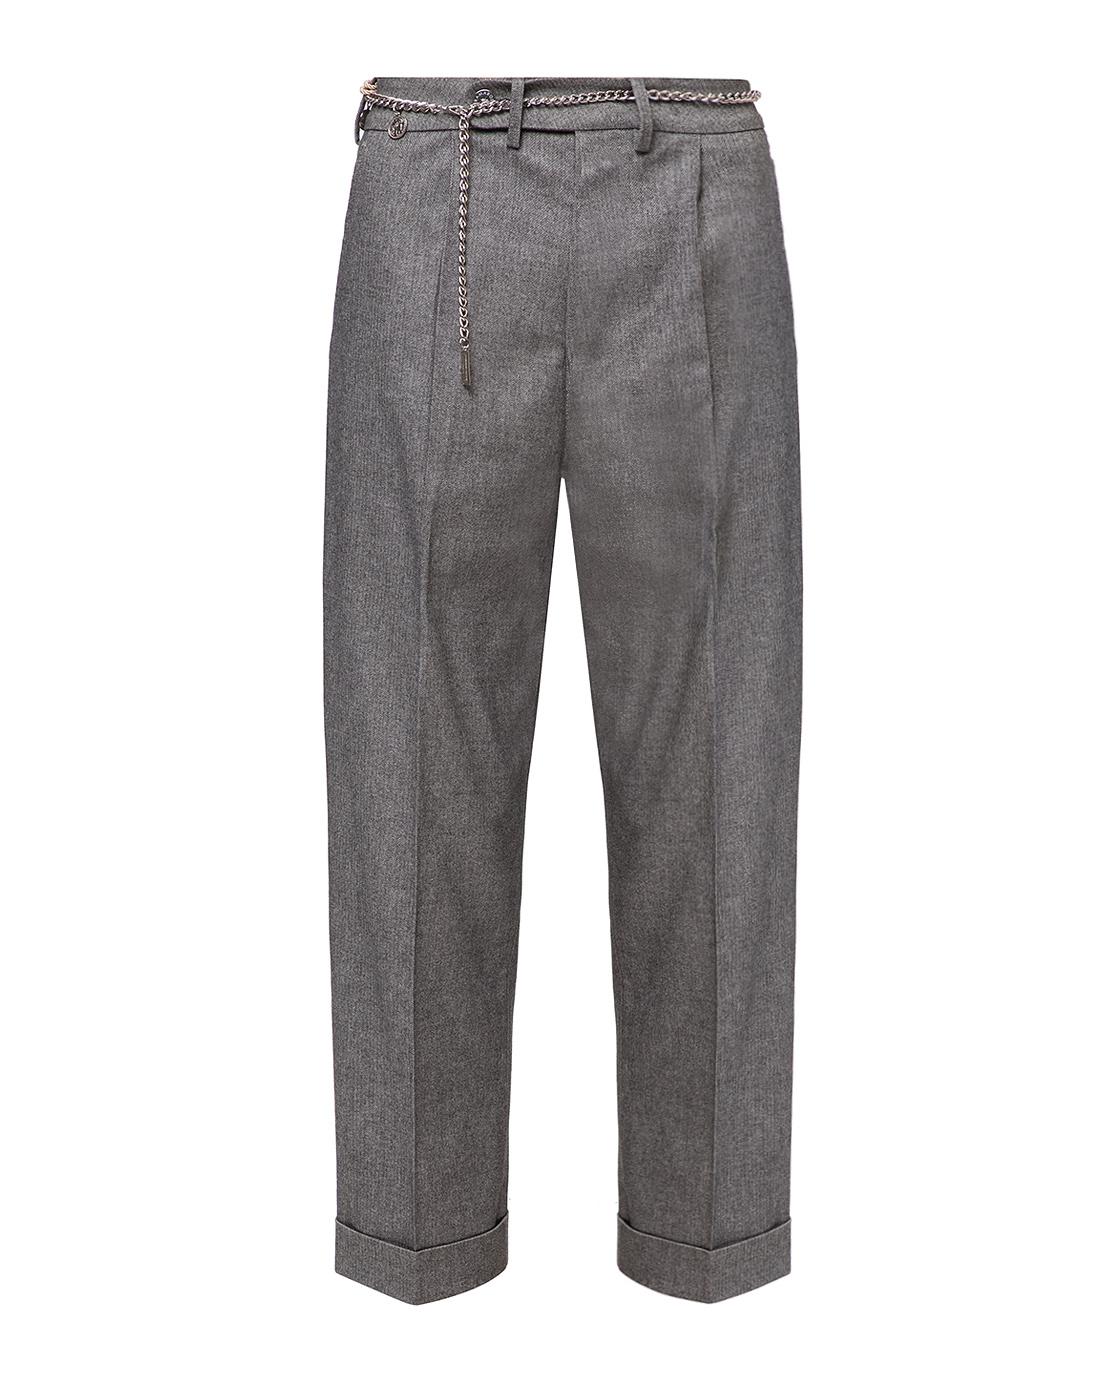 Женские серые брюки Tramarossa SO168-1